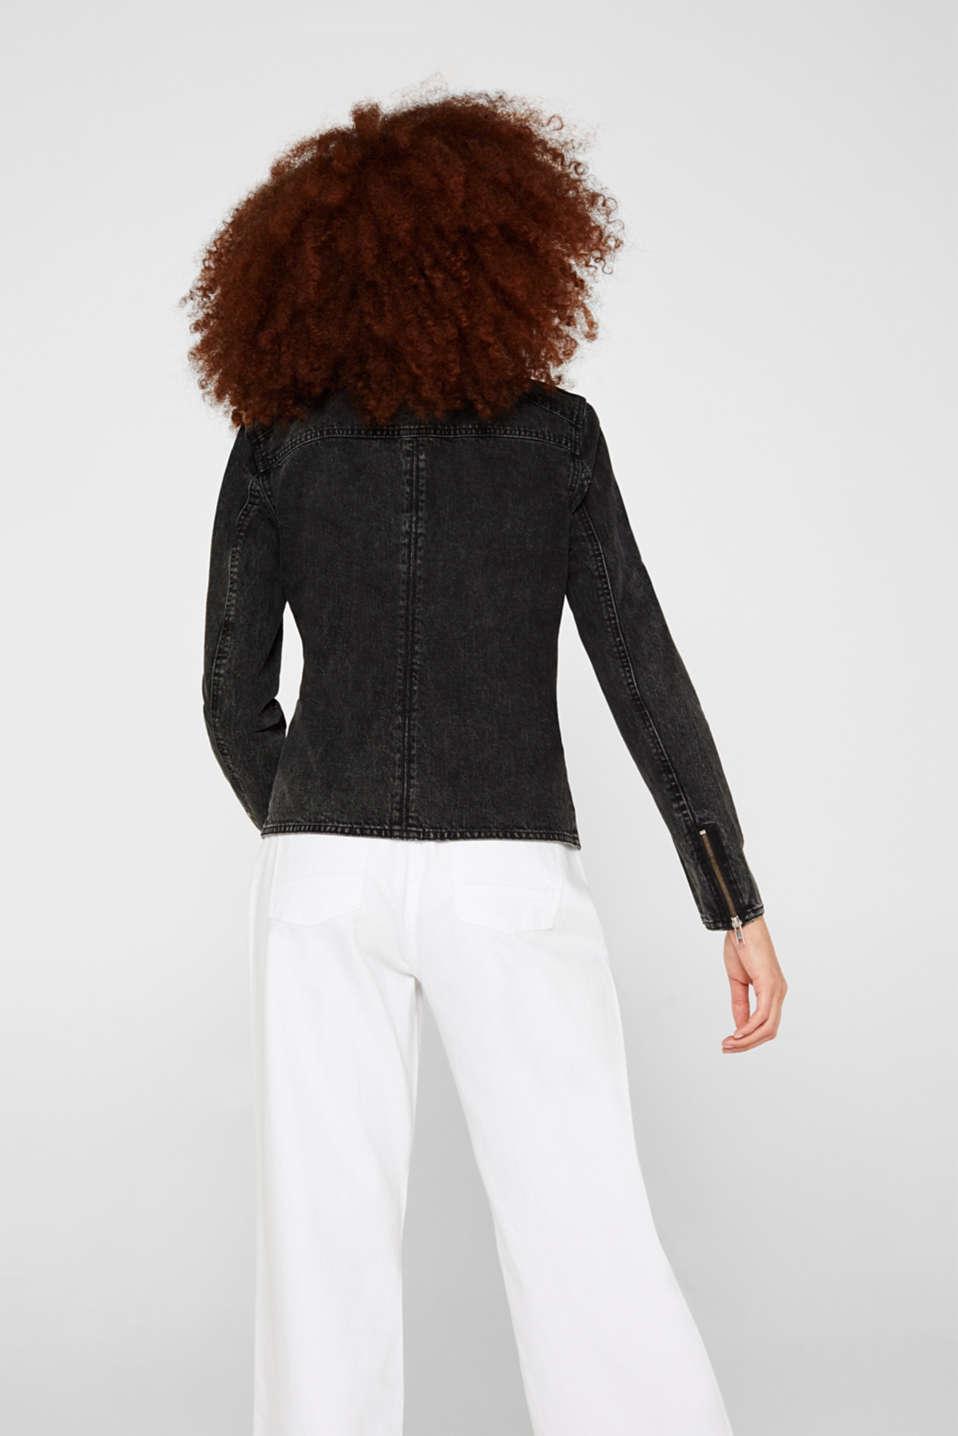 Jackets indoor denim, GREY DARK WASH, detail image number 3